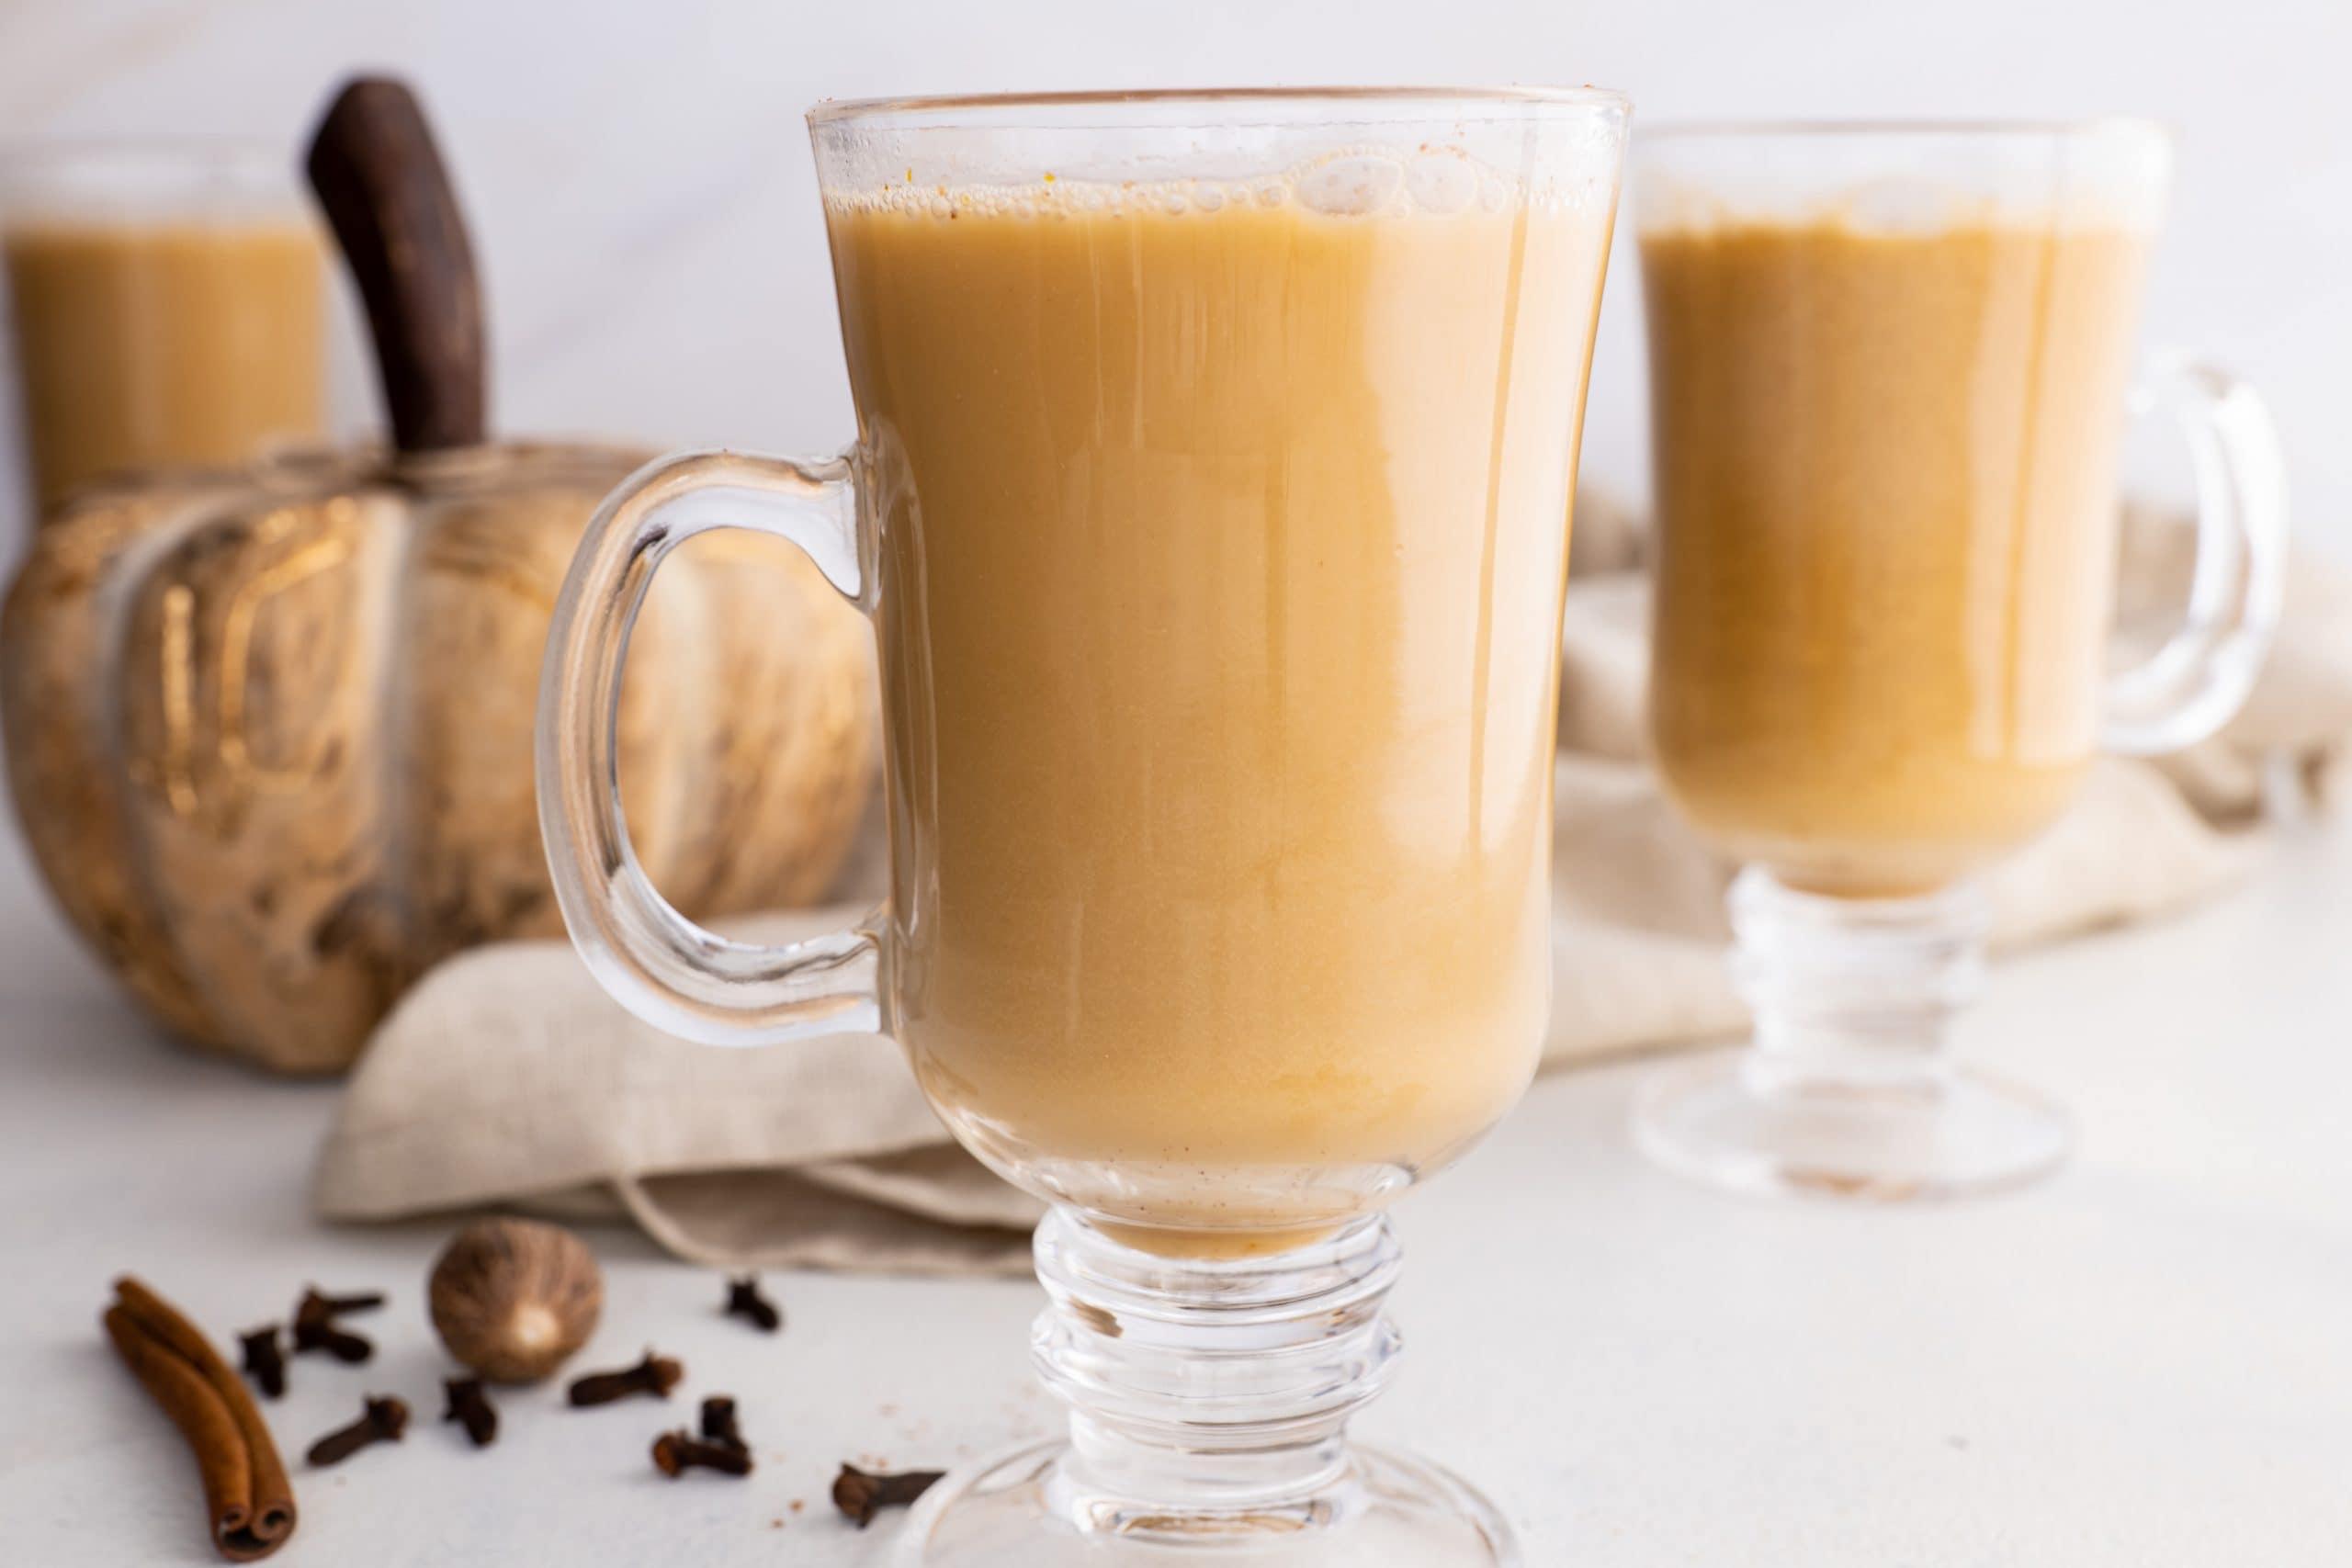 A homemade pumpkin spice latte shows through a tall glass mug. A wooden pumpkin is in the background.